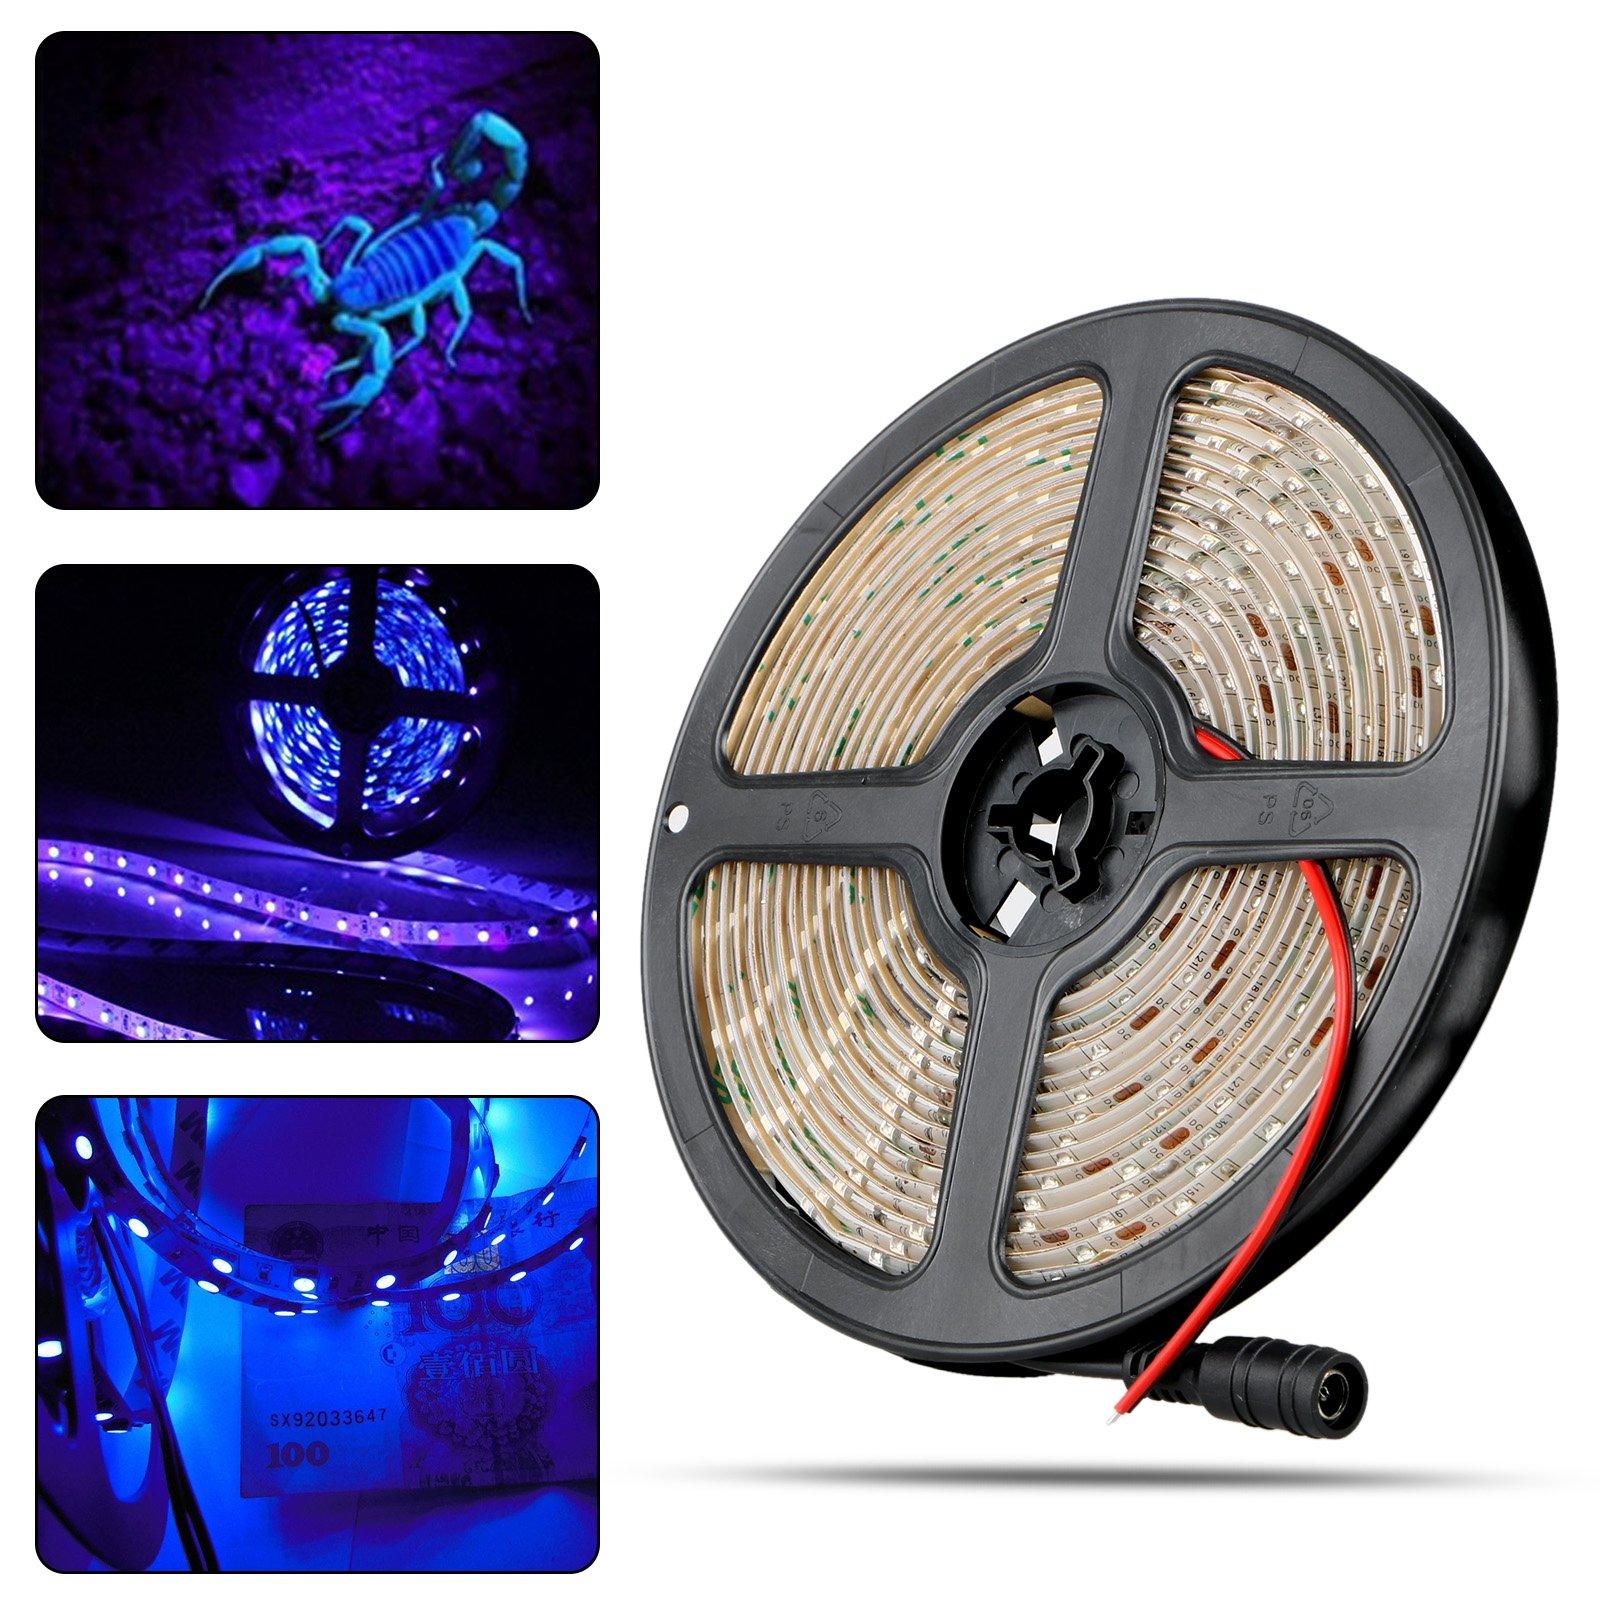 LinkStyle UV/Ultraviolet Black Lights LED Strip 300 LEDs 16.4Ft/5M 3528 Flexible Waterproof Blacklights Purple Light Night Fishing Sterilization Implicitly Party